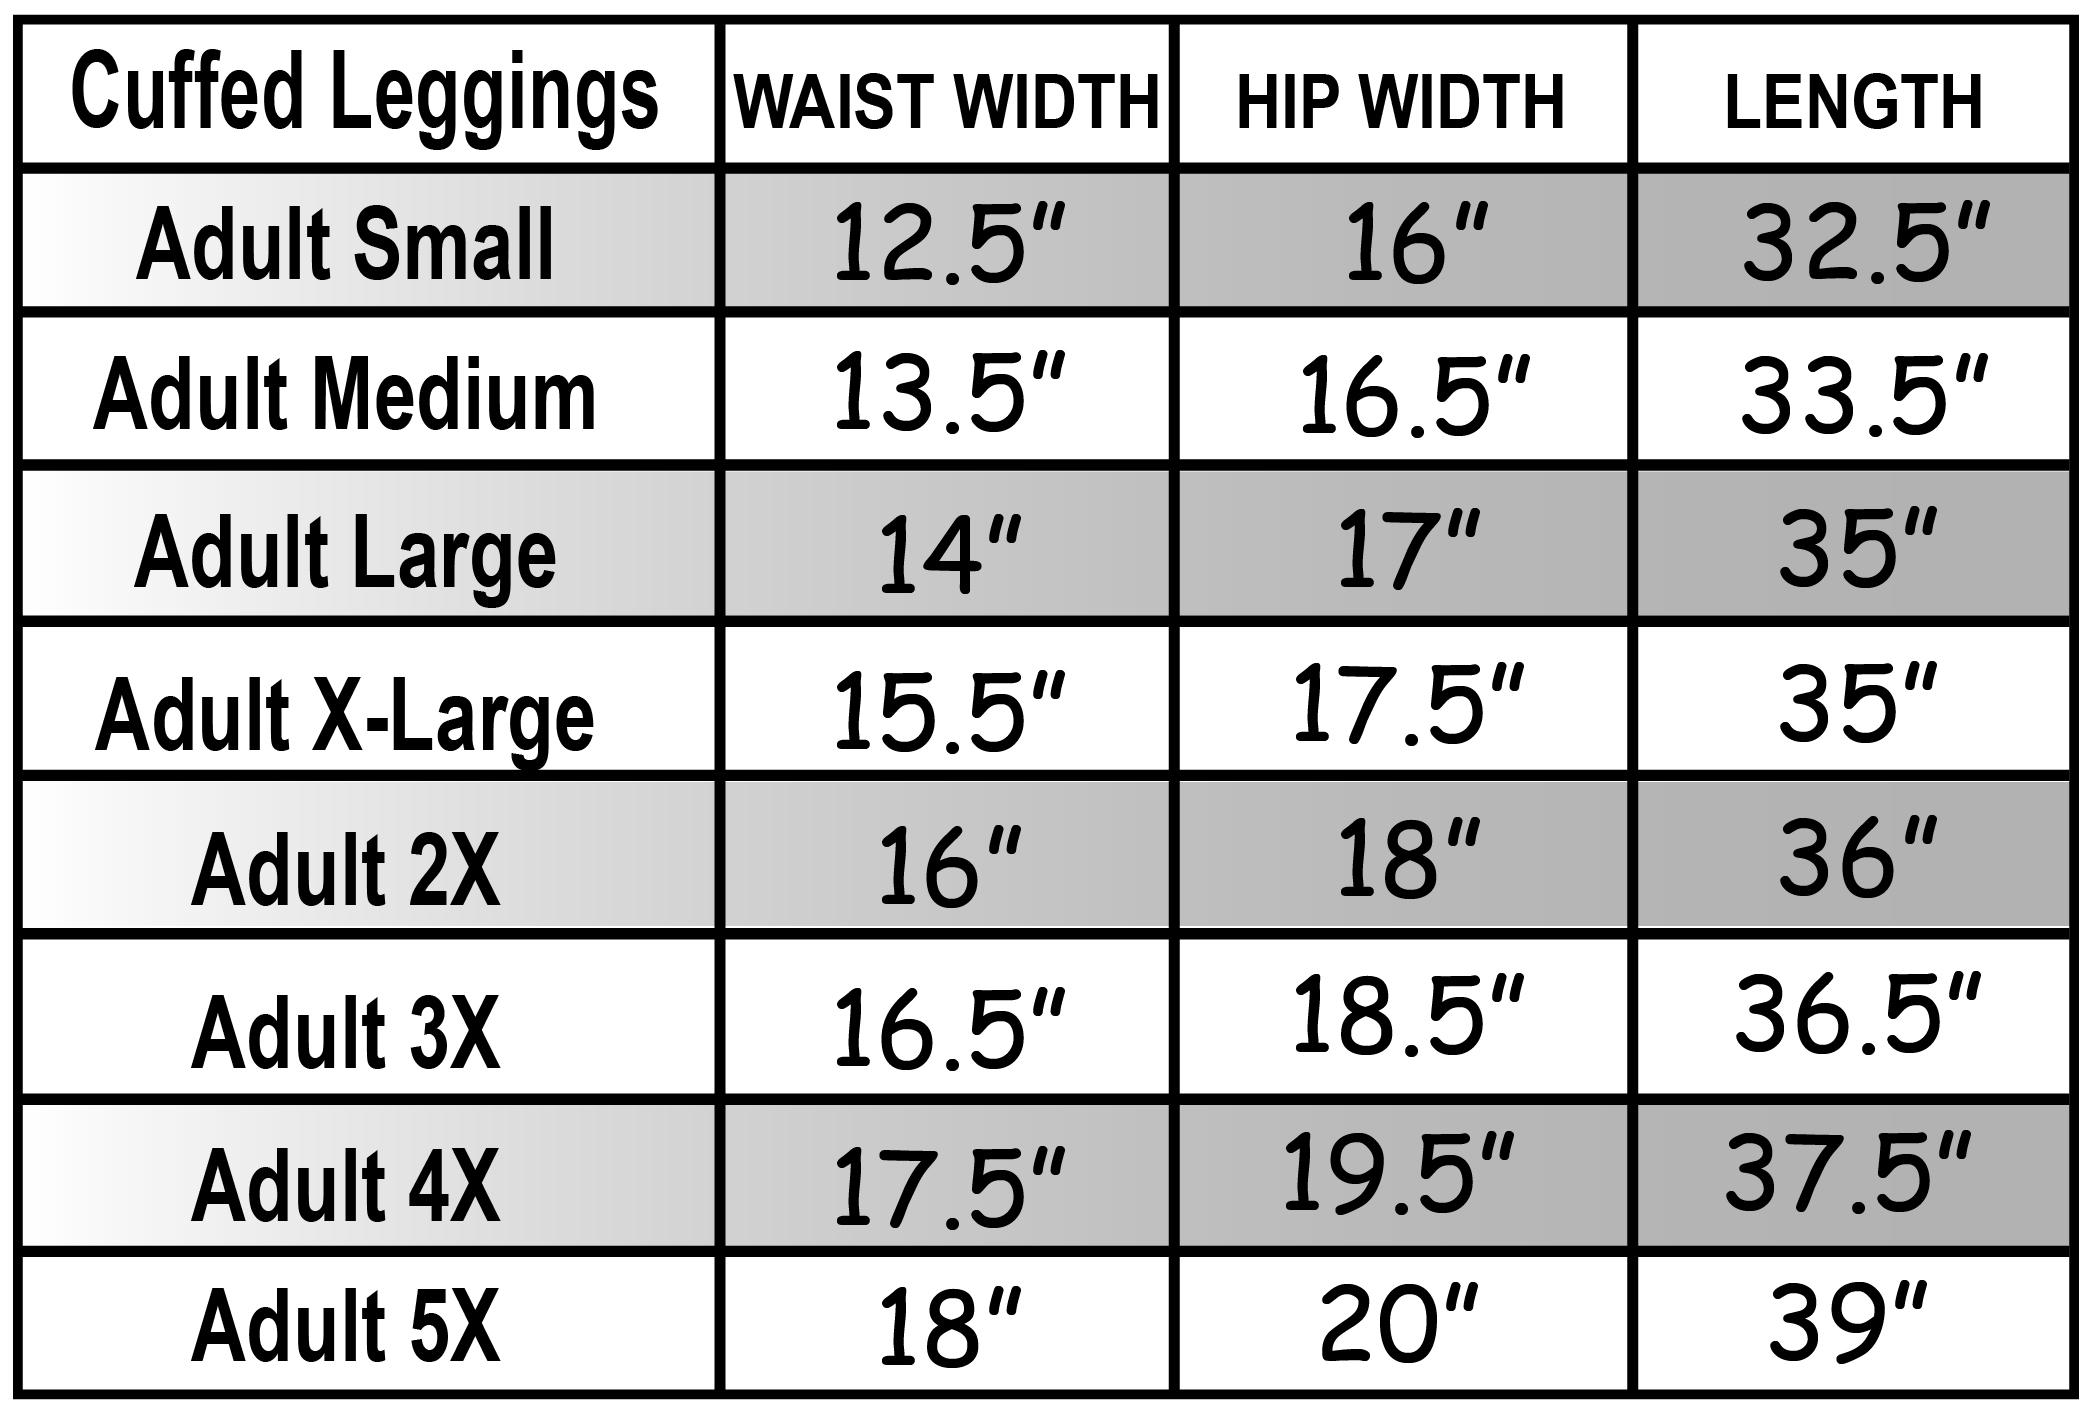 Cuffed Leggings Size Chart